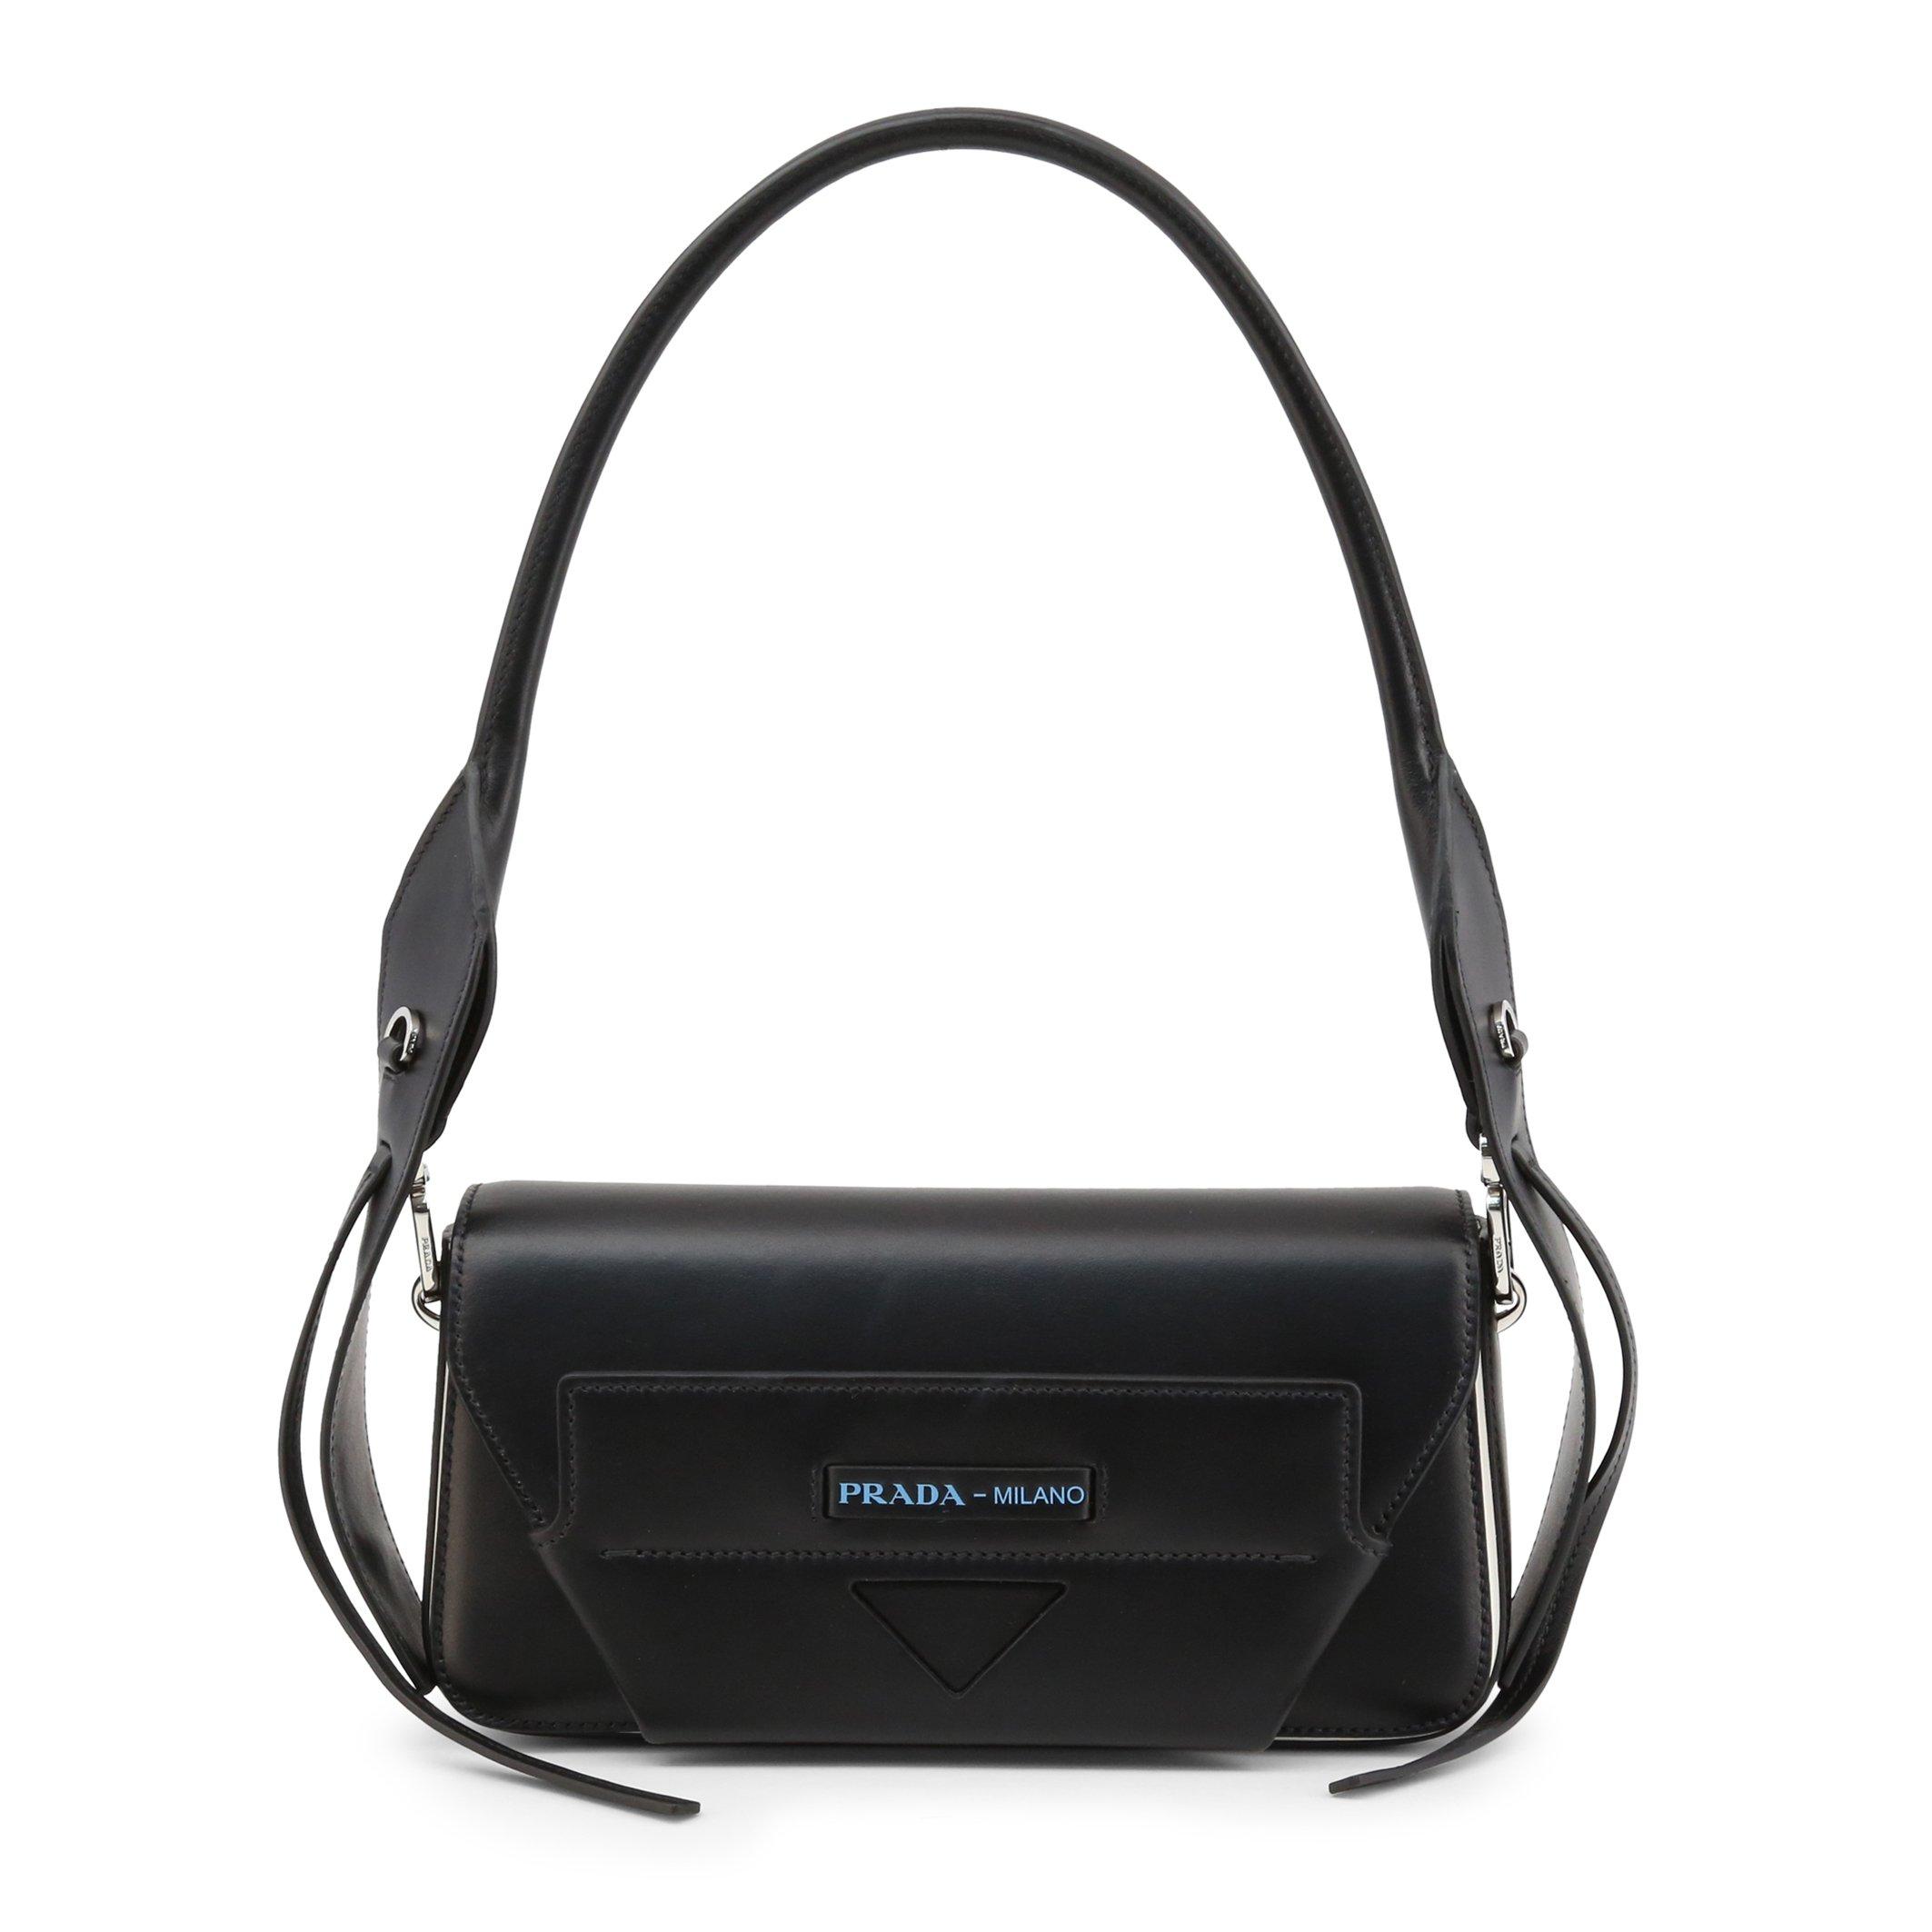 Prada Women's Shoulder Bag Blue 1BD166_CITY - black NOSIZE